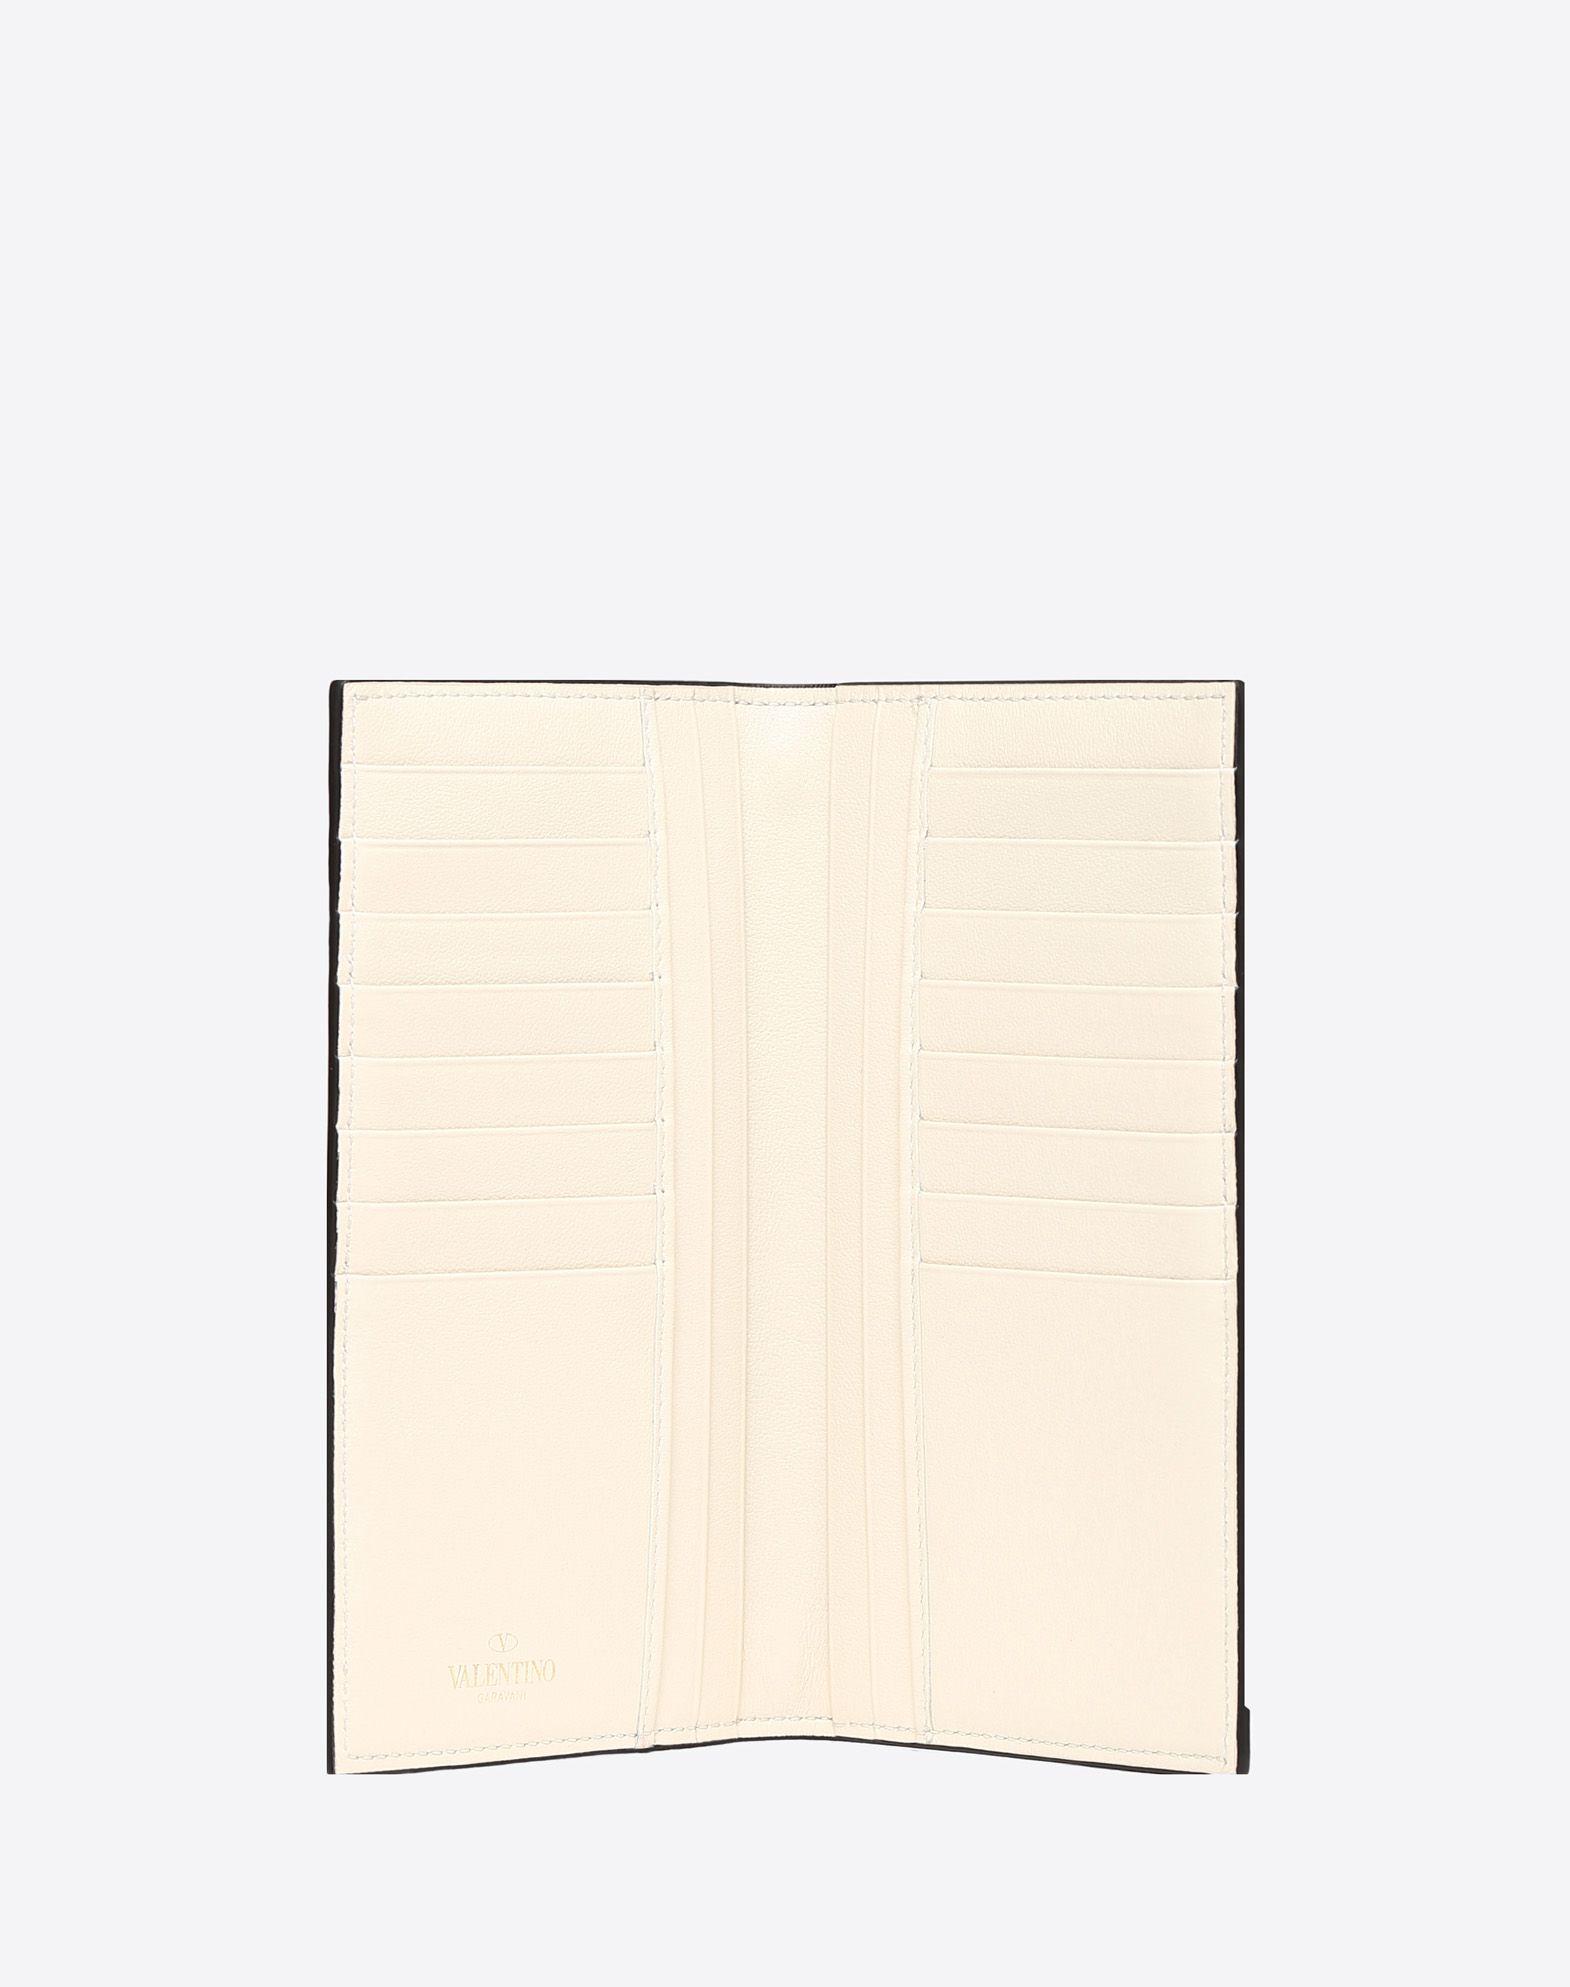 VALENTINO GARAVANI Rockstud Card Holder COIN PURSES & CARD CASES D e